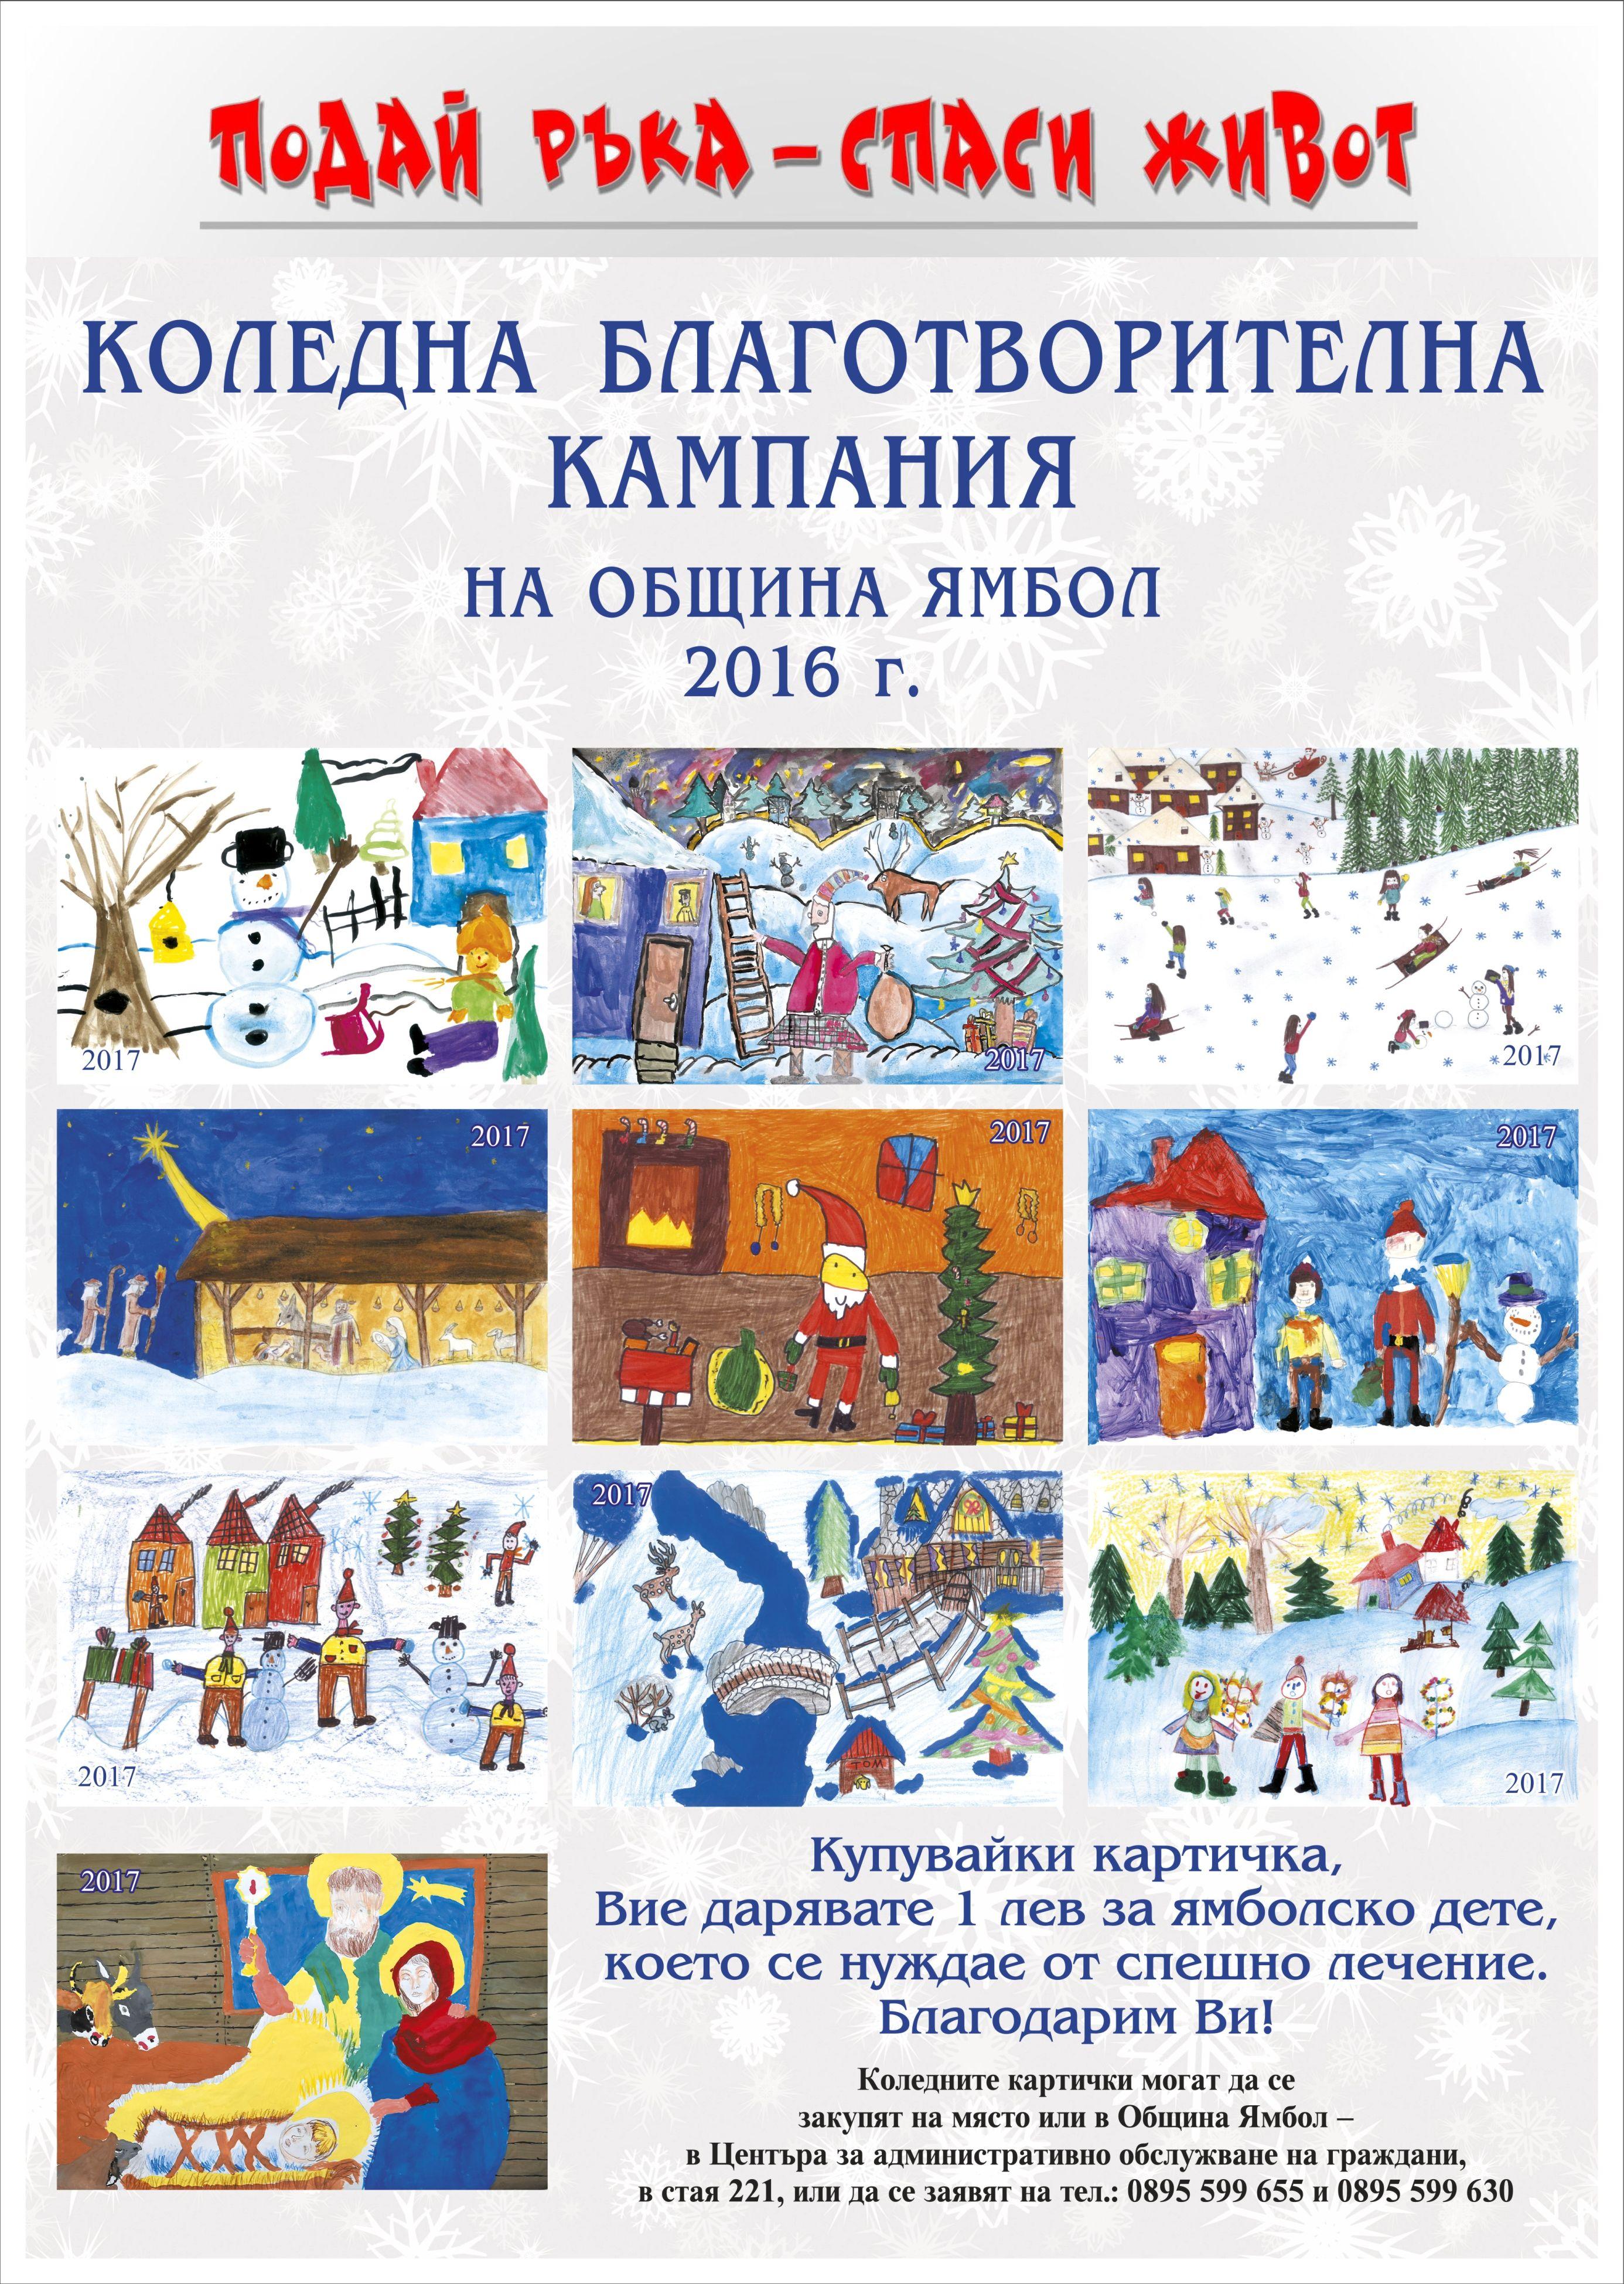 2_podai_raka_spasi_jivot-2016_plakat